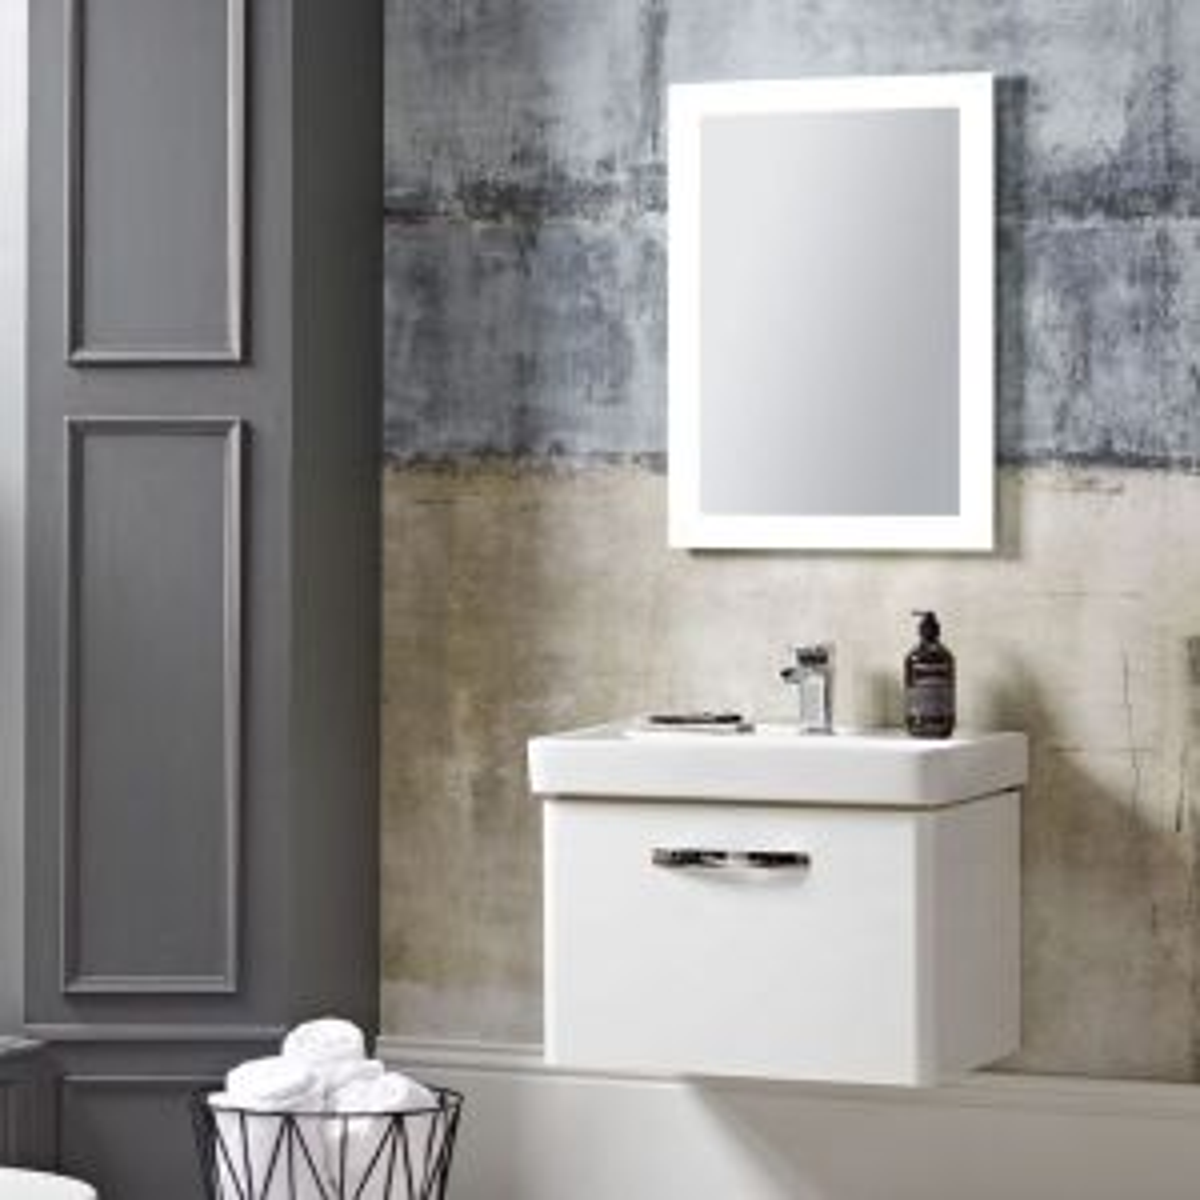 Tavistock Compass Gloss Clay Wall Mounted Vanity Unit 500mm Lifestyle